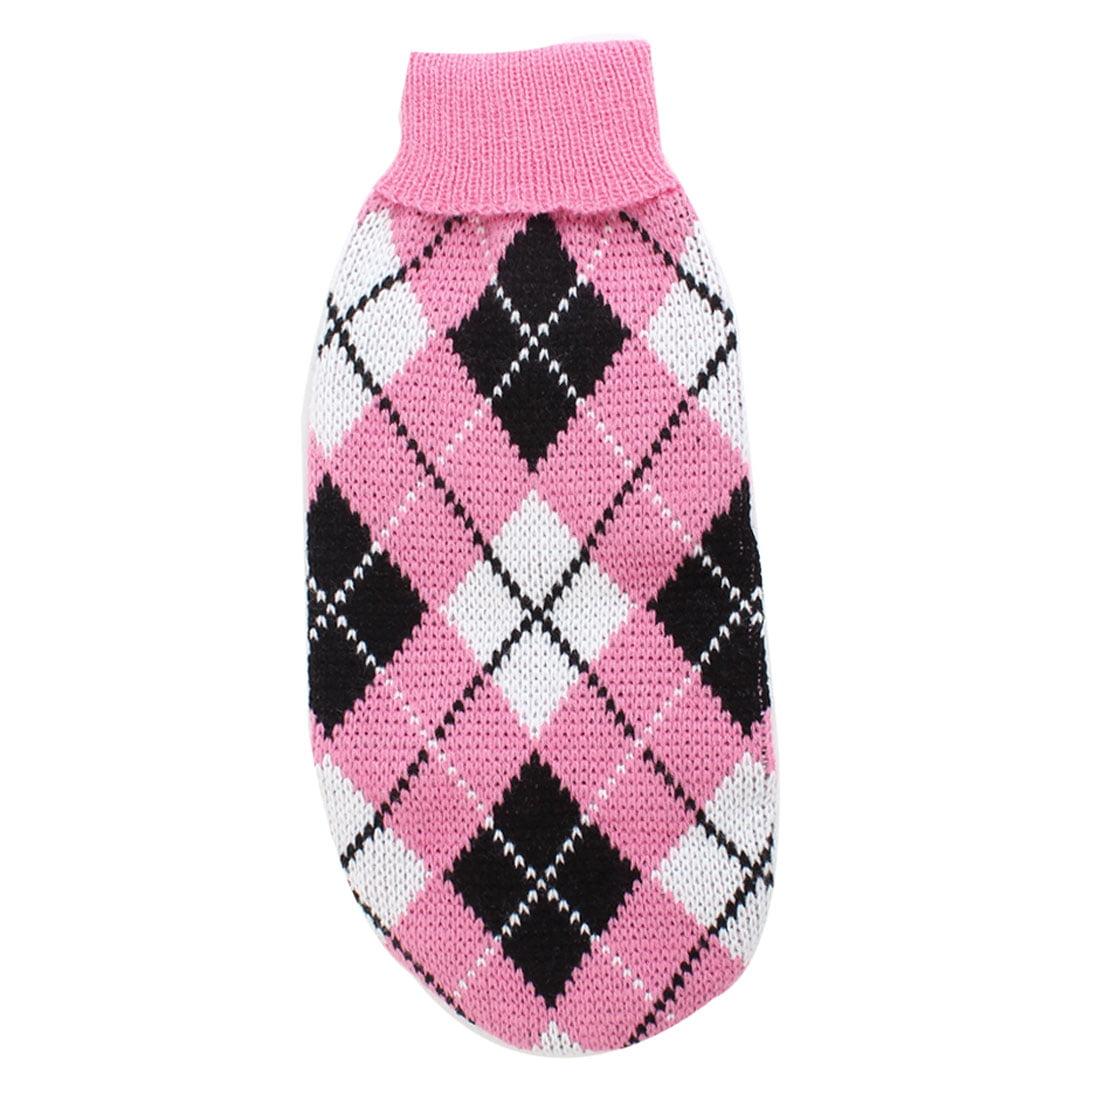 Unique Bargains Winter Turtleneck Ribbed Hem Pet Dog Doggy Knitwear Sweater Tri Colors XXS